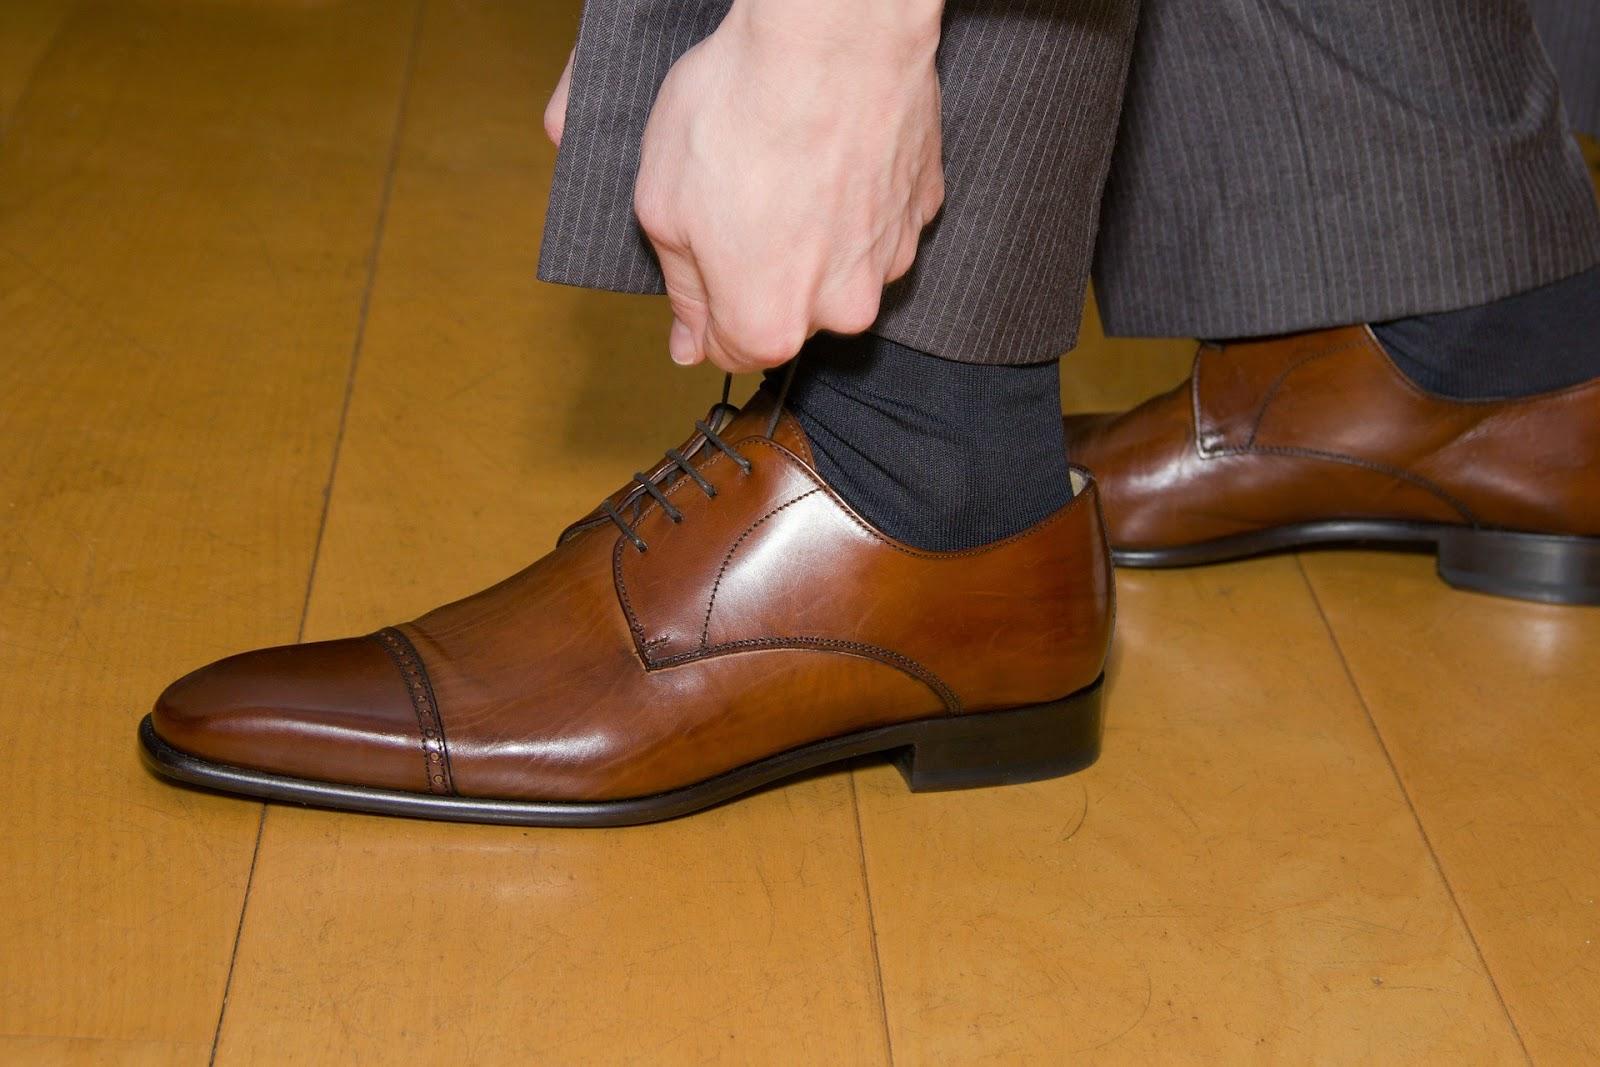 Tip για να μην γλιστράνε τα παπούτσια σας